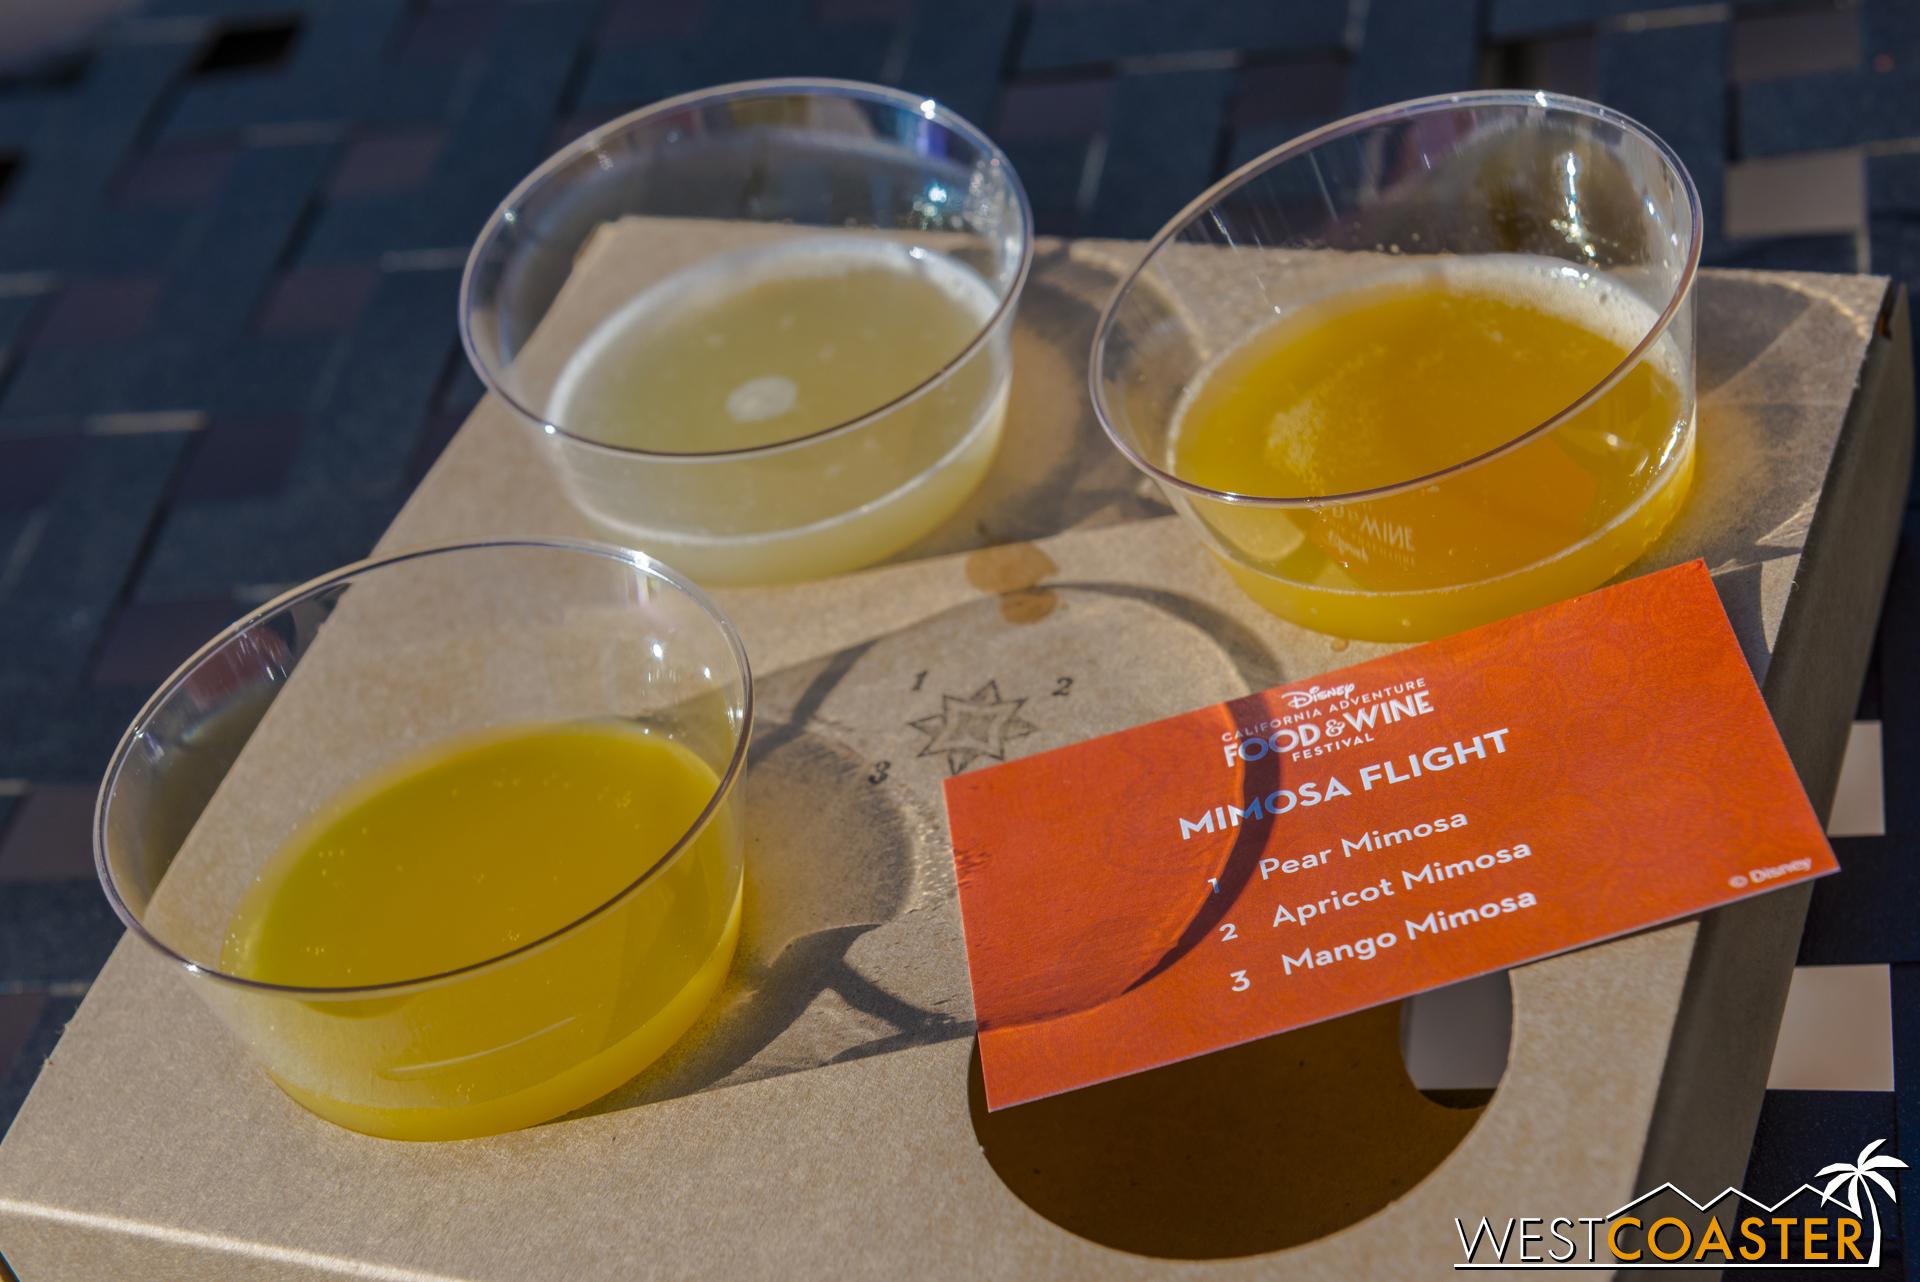 From Uncork California:  Flight - Mimosa   Pear Mimosa, Apricot Mimosa, Mango Mimosa ($16.00)